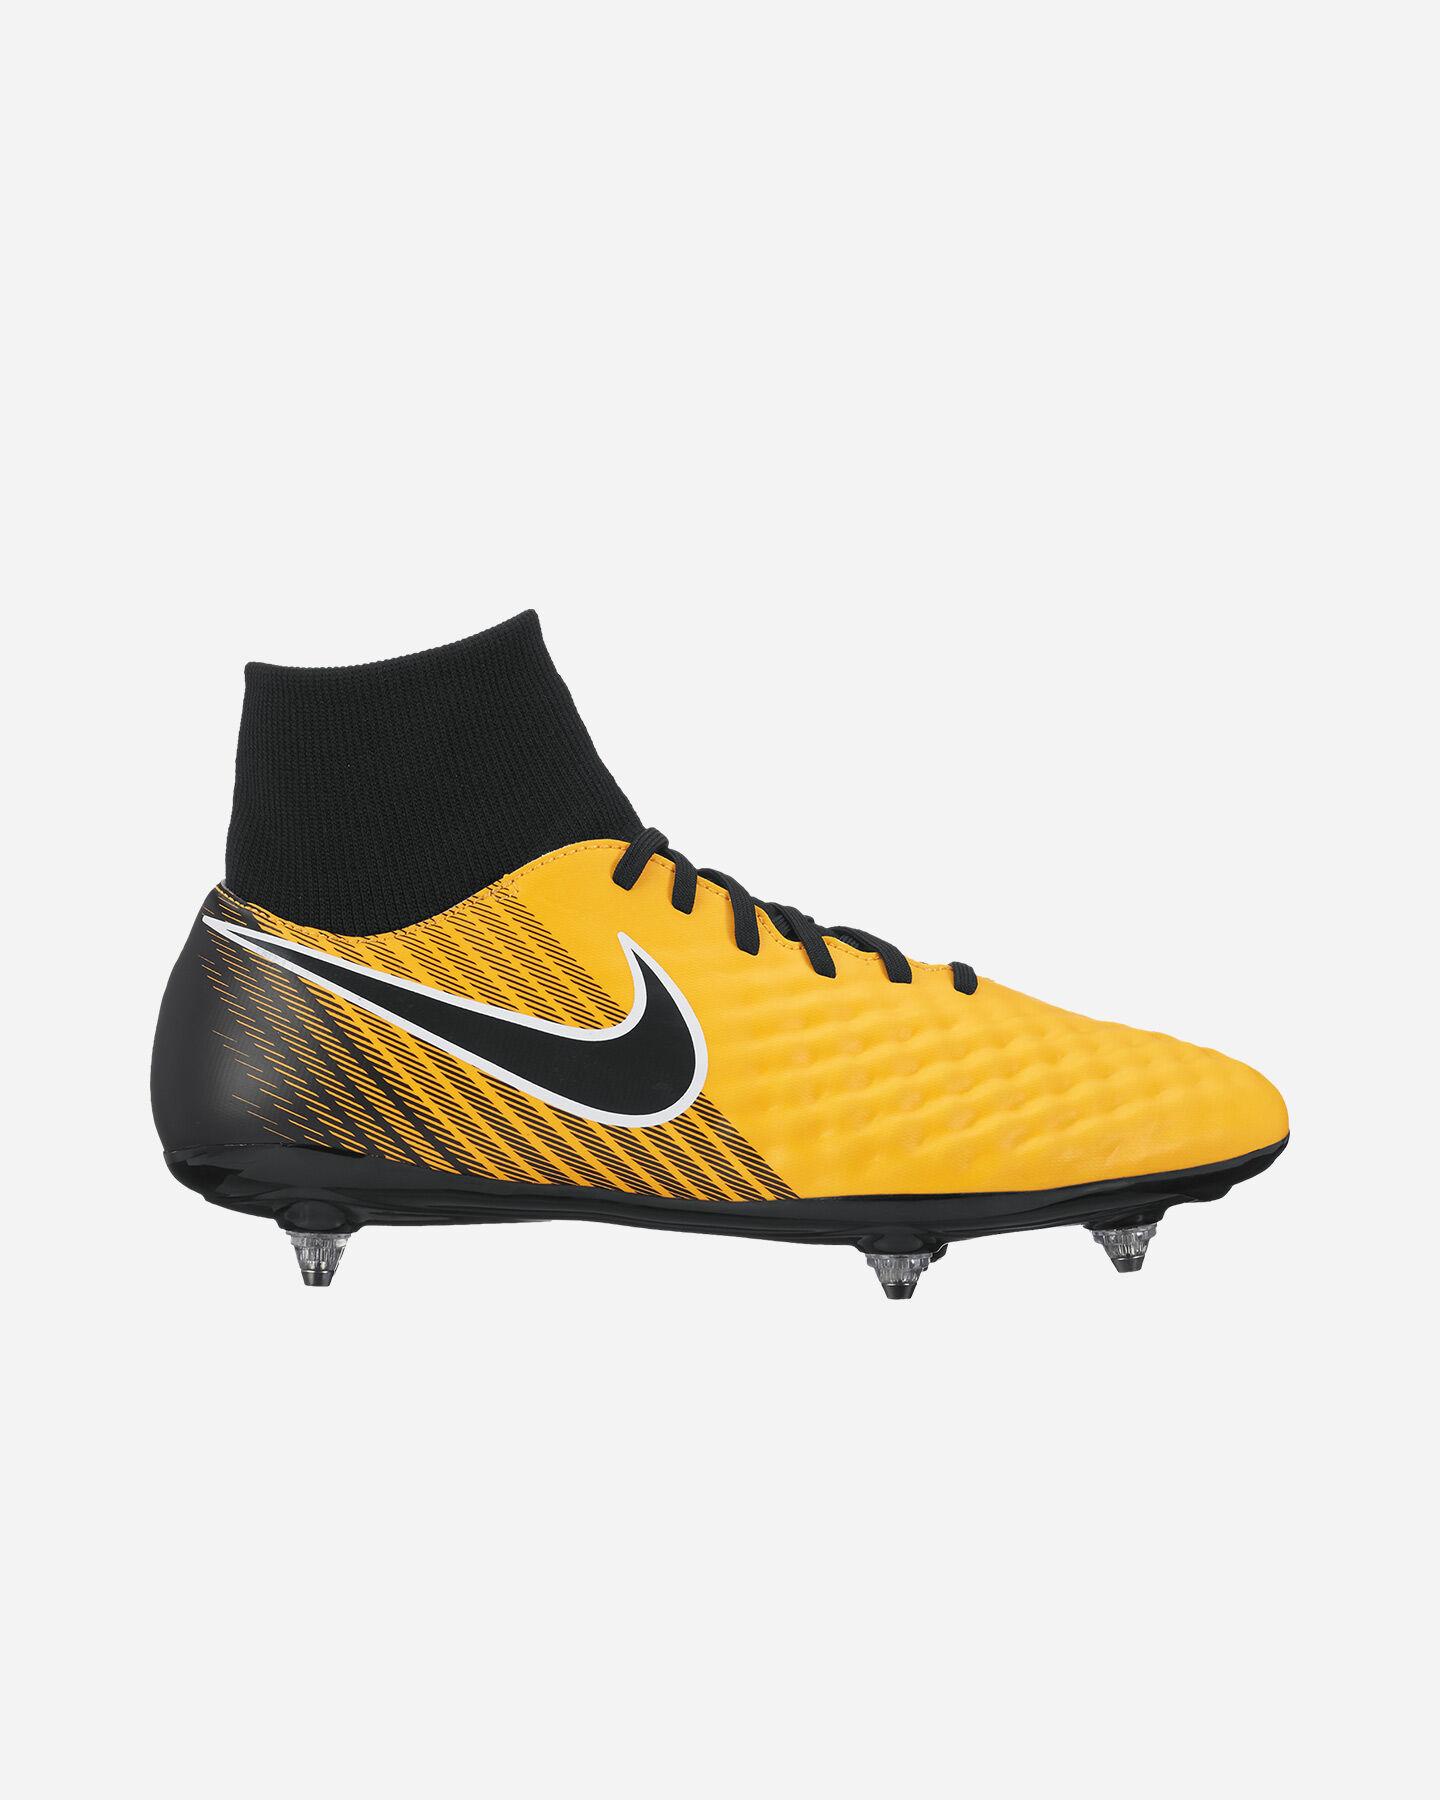 sneakers for cheap b2020 66621 S4021358 801.jpg